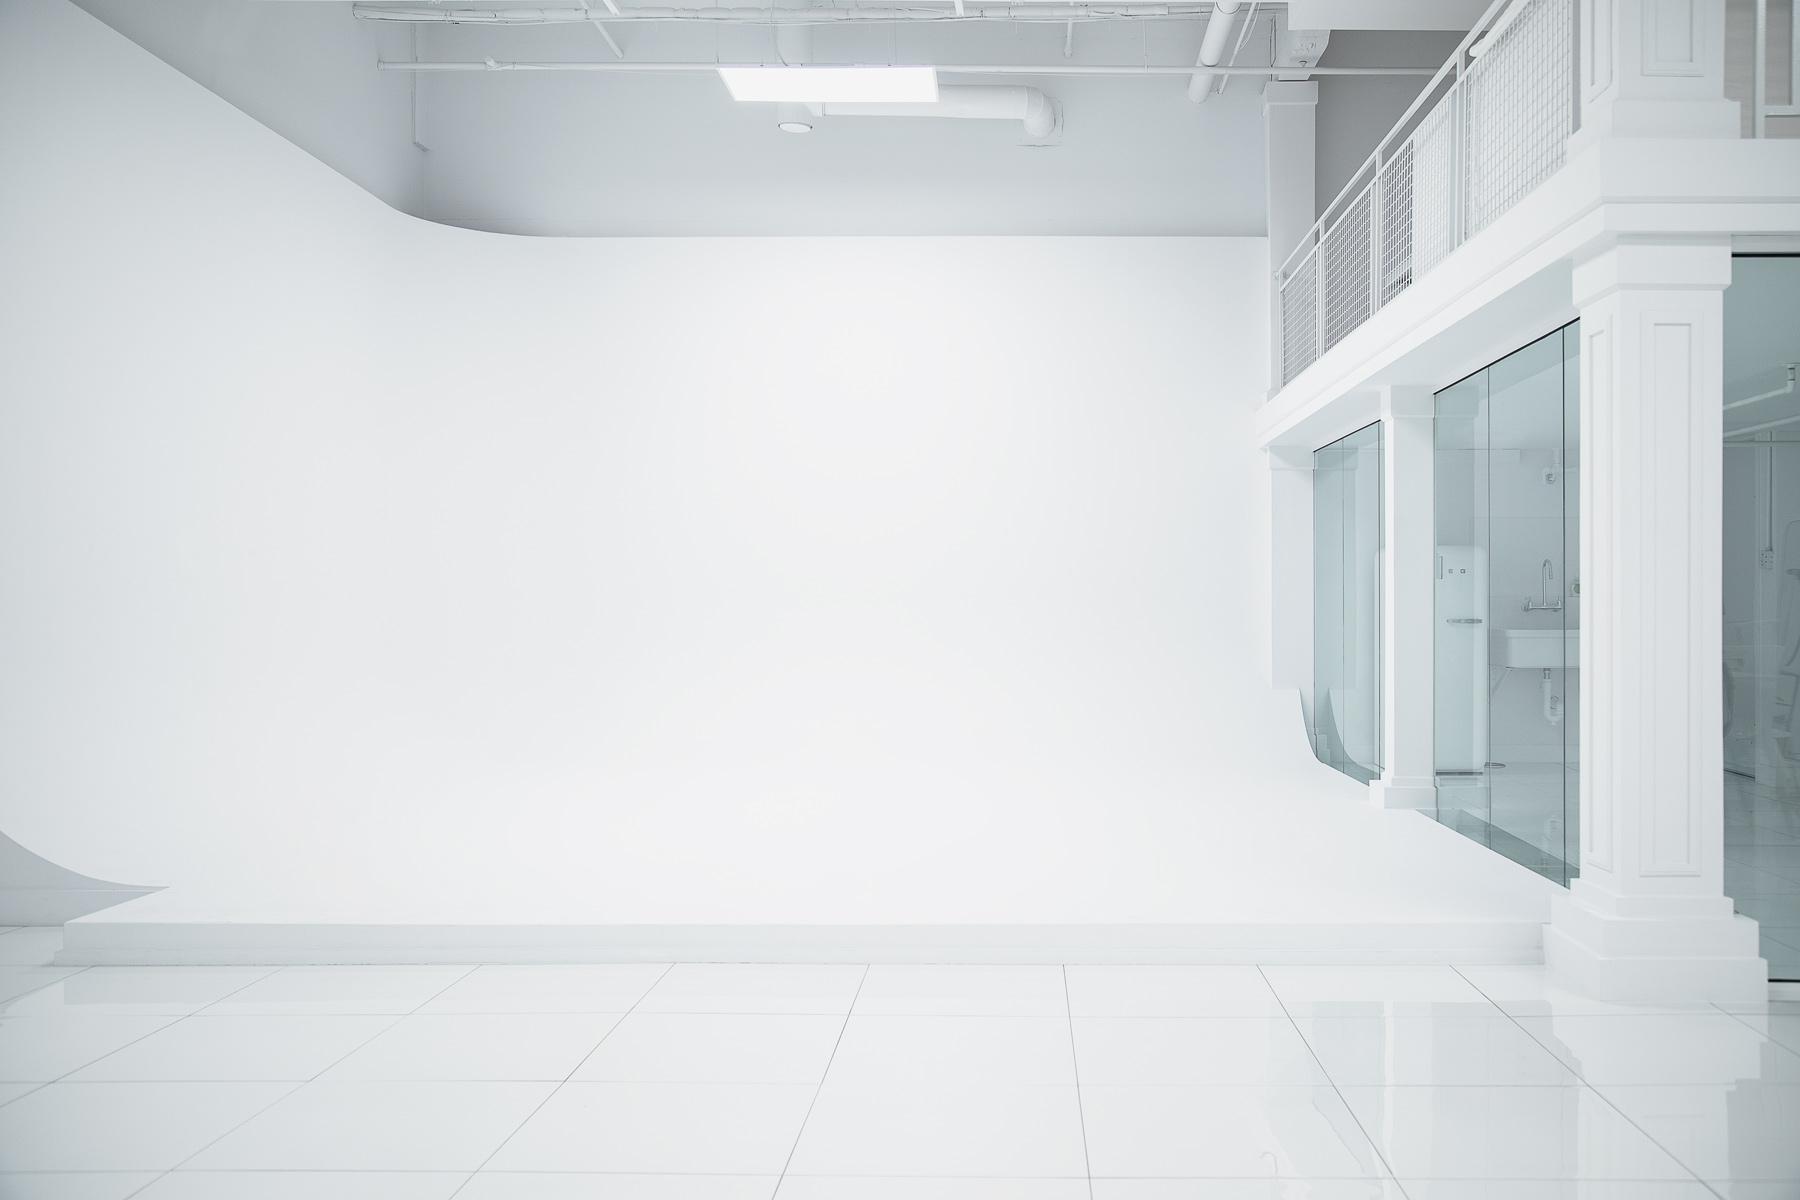 anexcessofwhite-photo2.2-DARKER-white-studio-montreal-photo-atelier.jpg